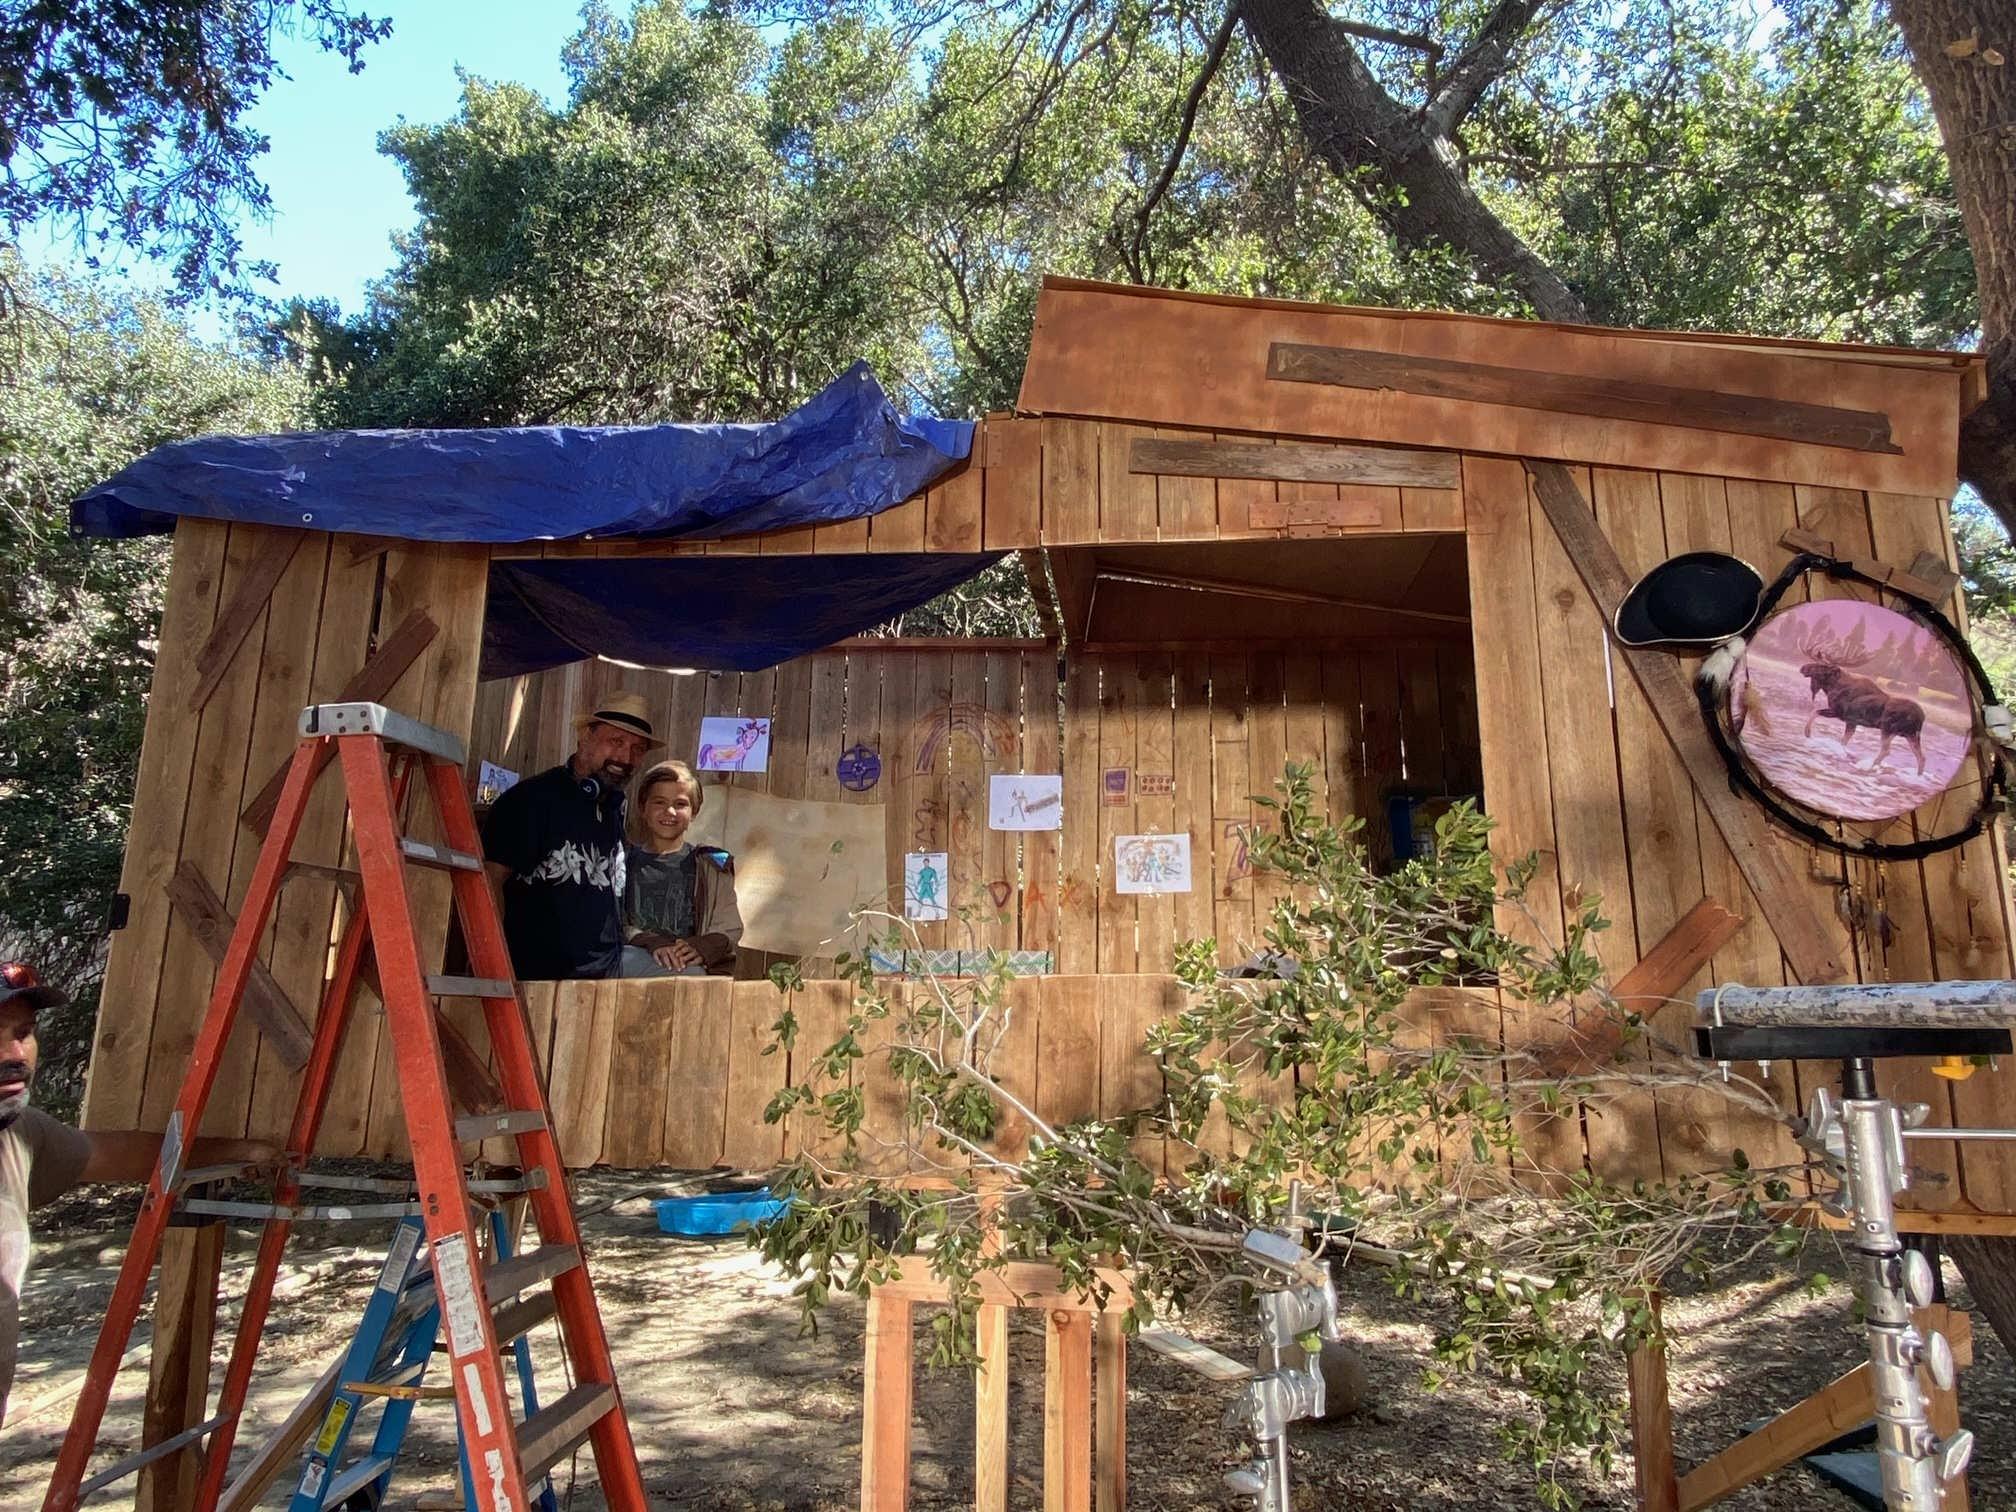 The Treehouse set